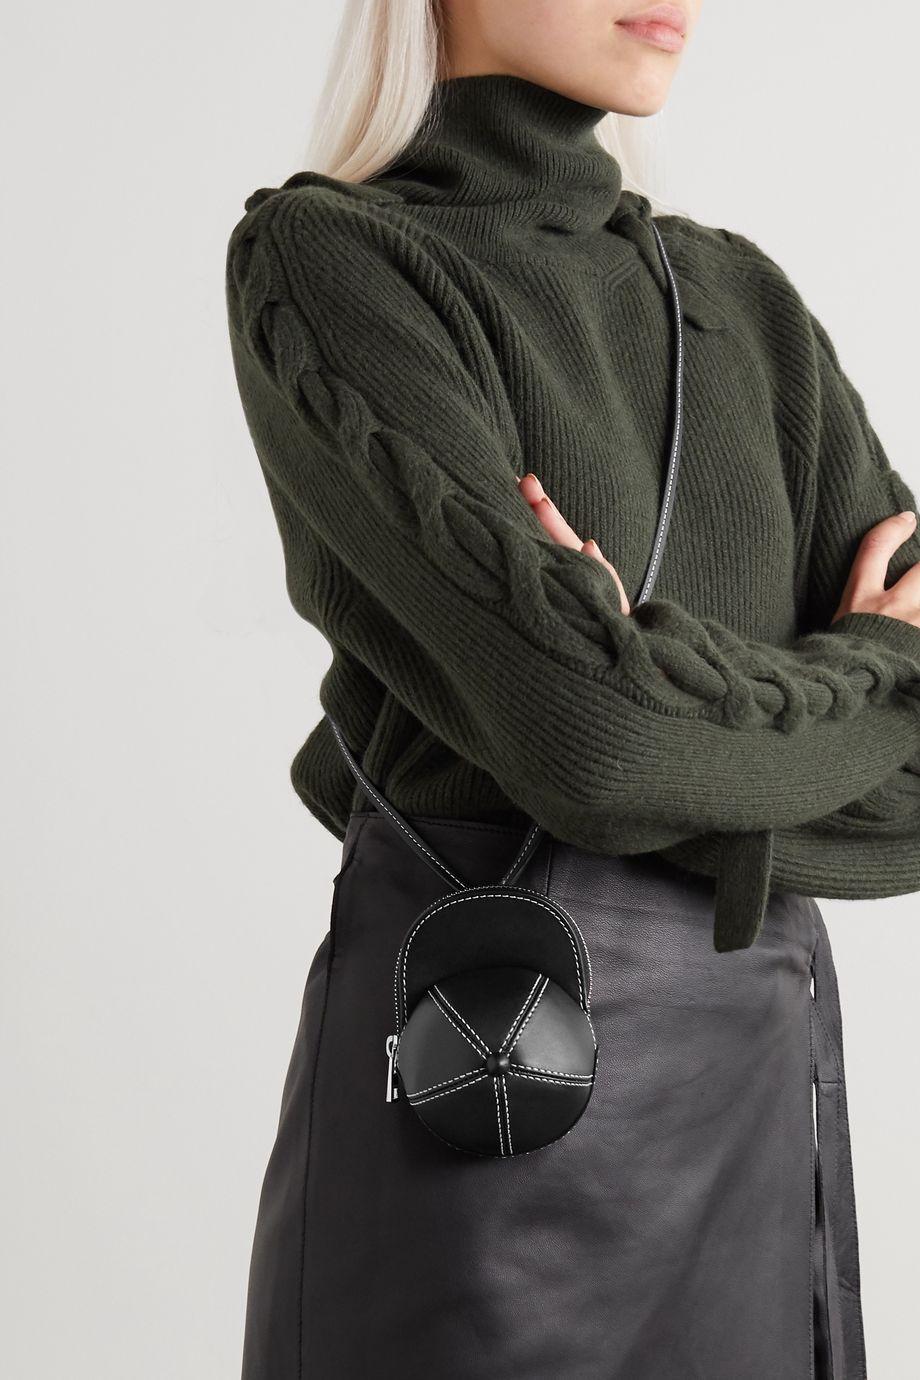 JW Anderson Nano Cap leather shoulder bag